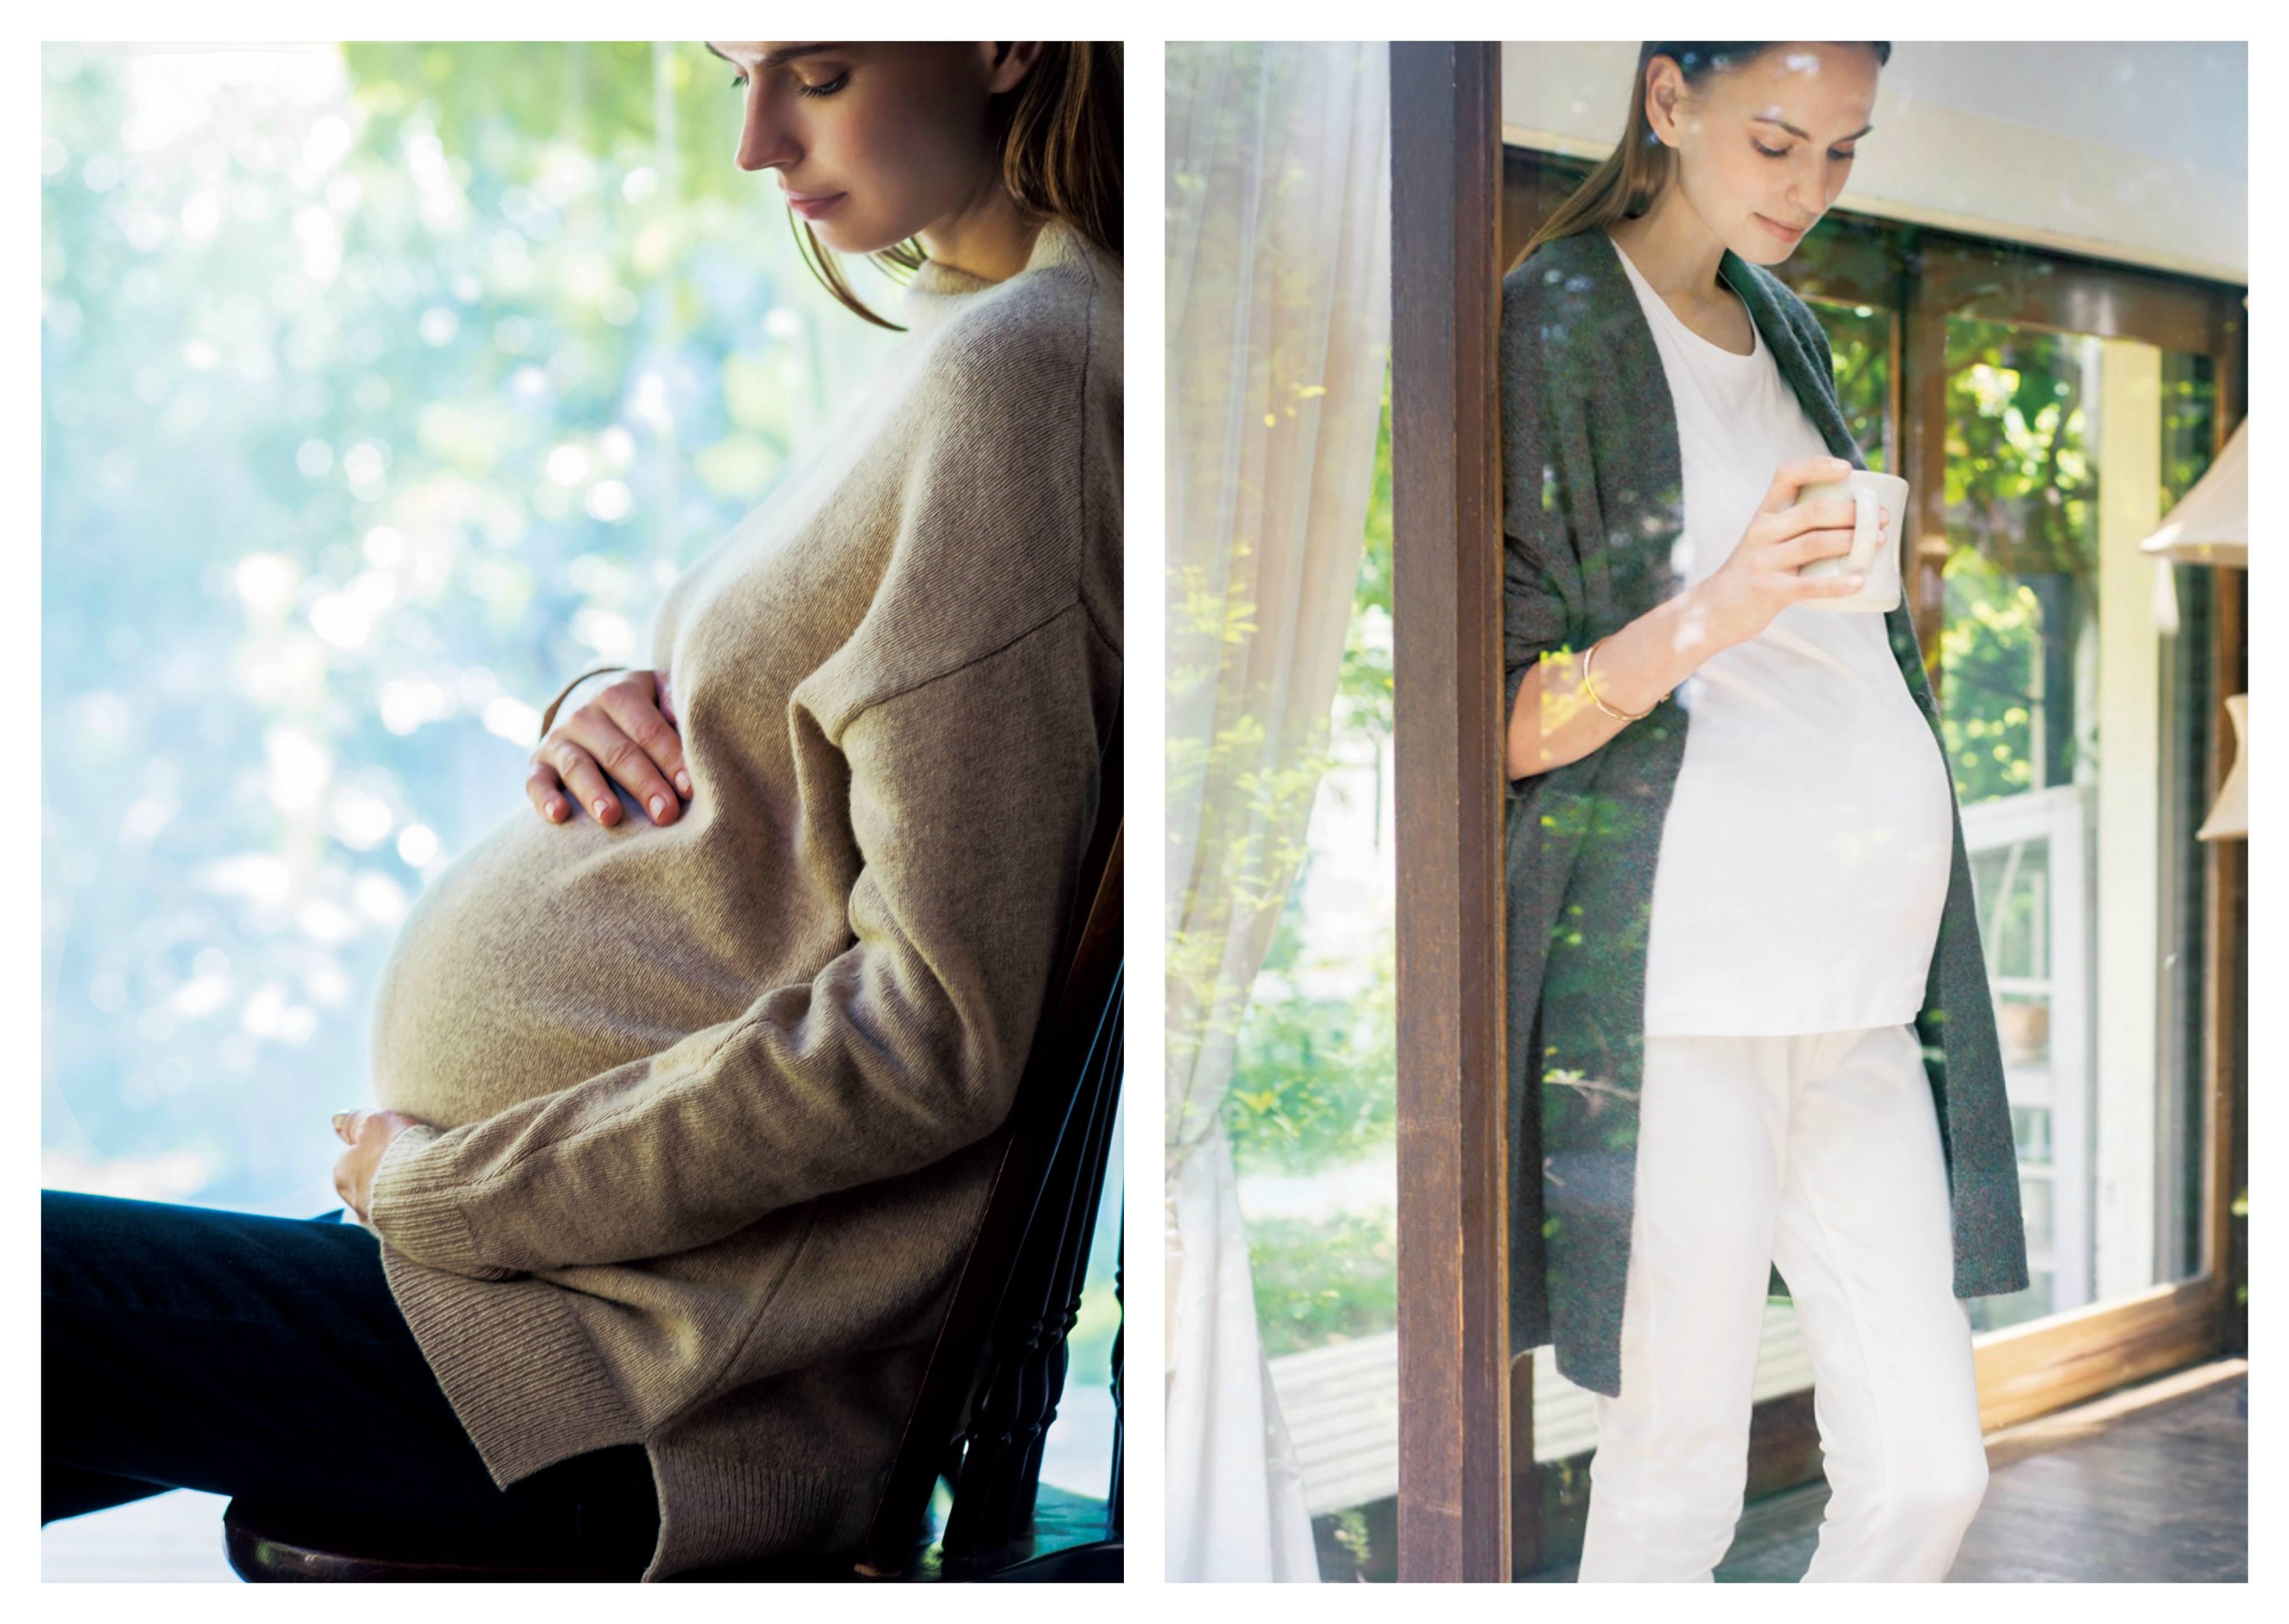 f4ab15af28b7f Sneak Peek: UNIQLO launches new Newborn & Maternity Lifewear line